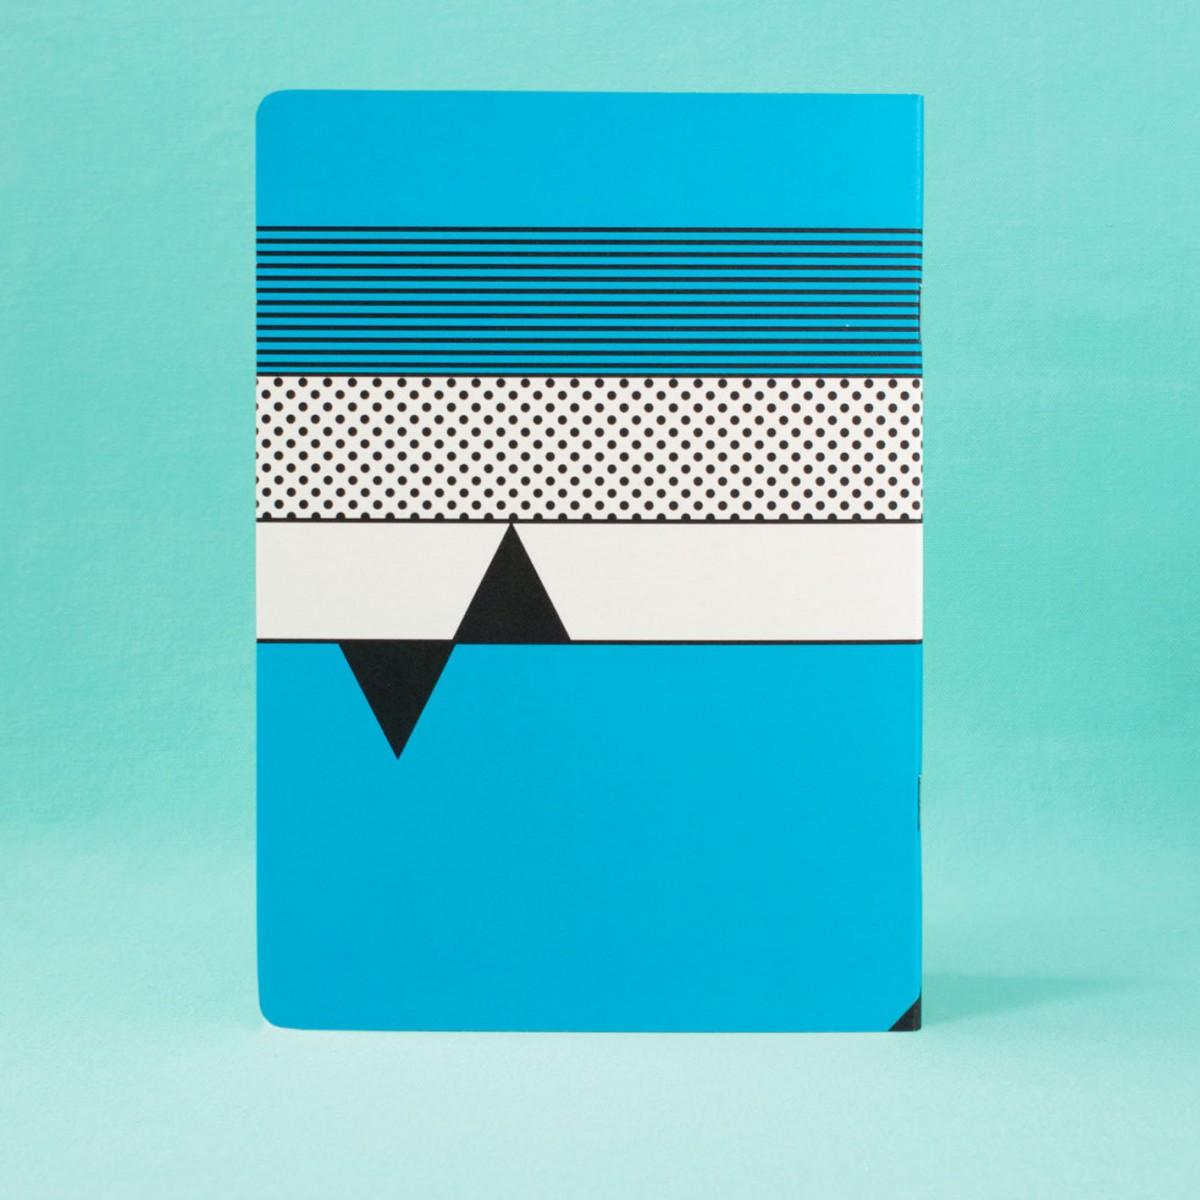 polypodium / Notizheft - A5 - I ♥ Memphis / blue